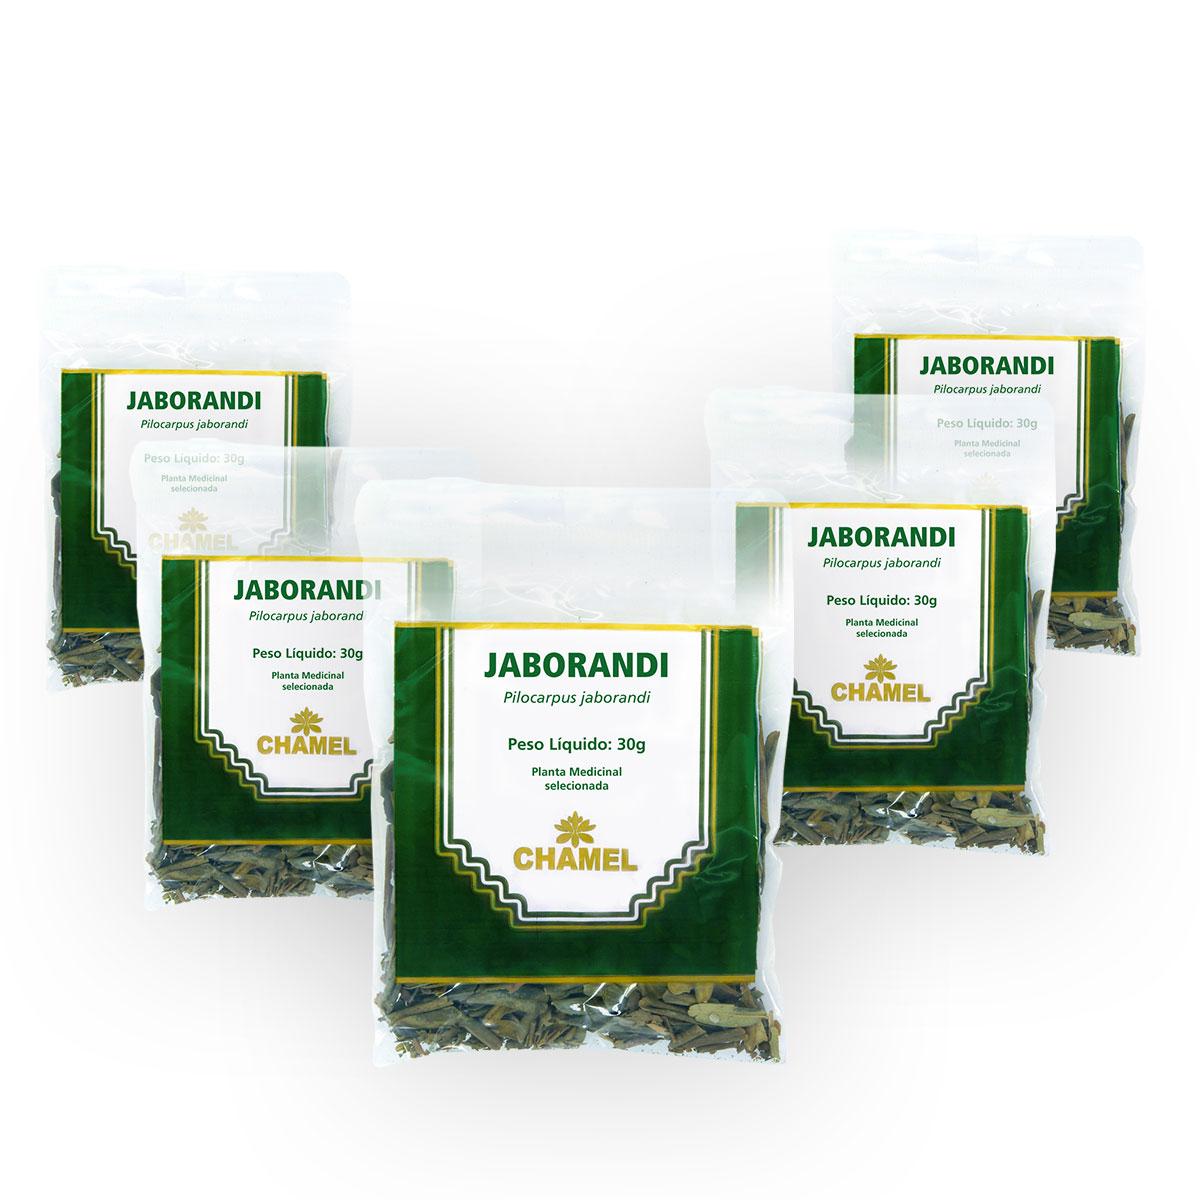 Jaborandi 30g Chamel com 5 Unidades - Chá-Folhas